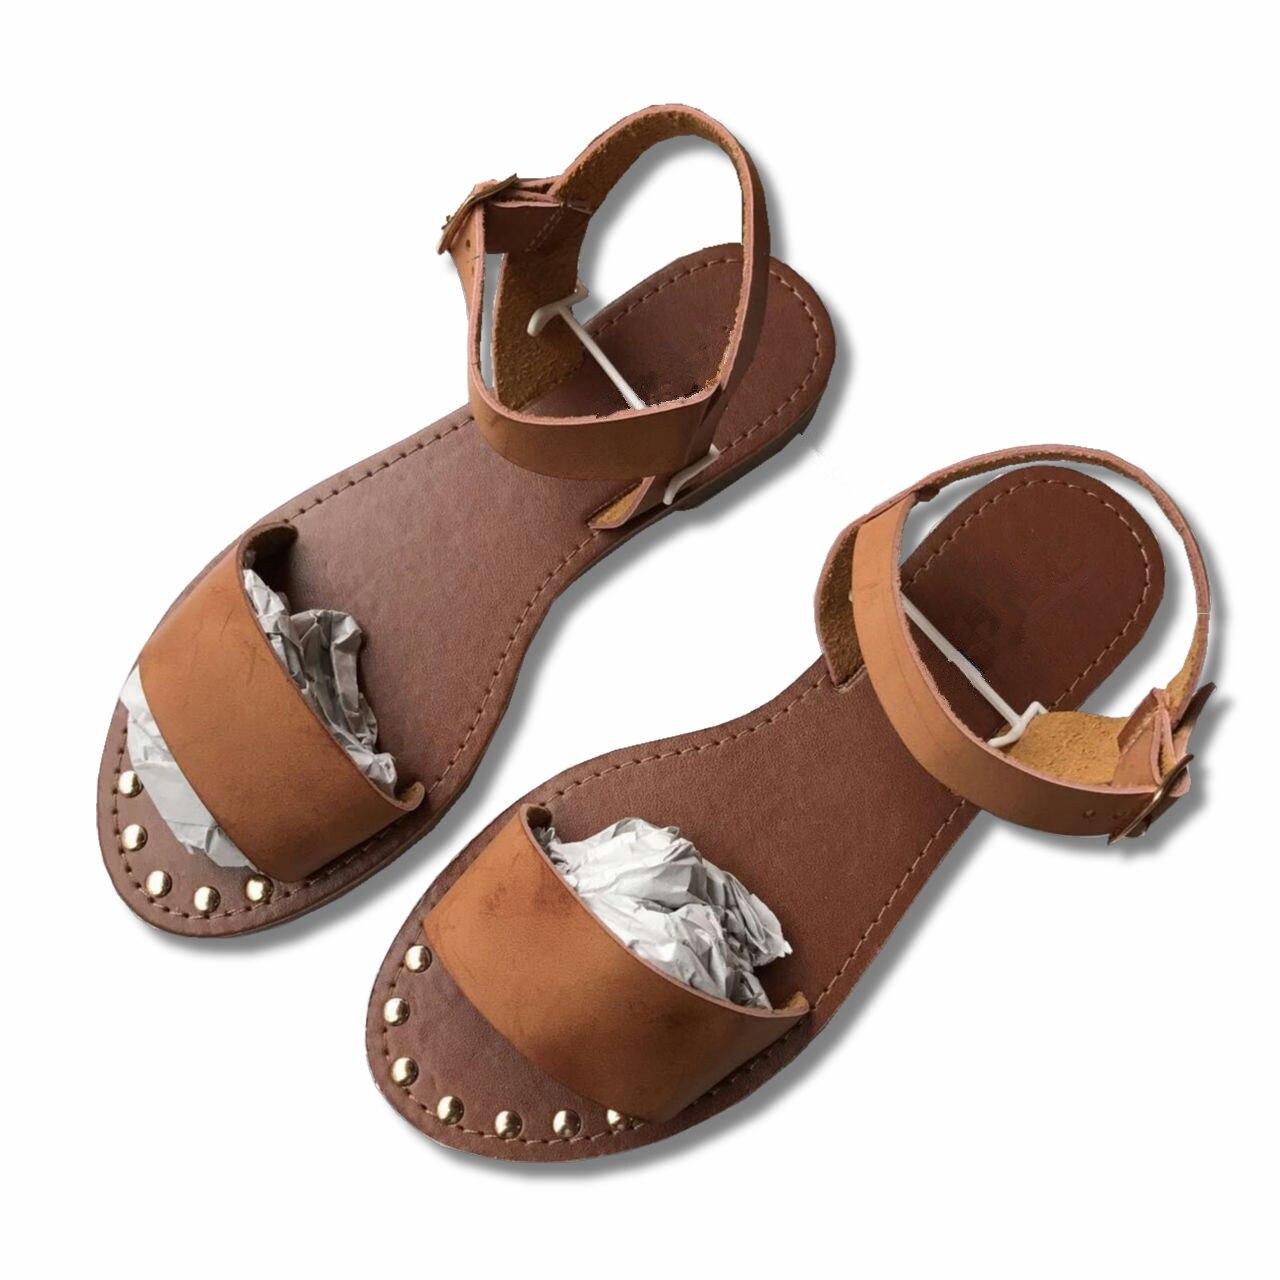 Women Sandals 2019 New Summer Slip-On Peep Toe Casual Sandals Gladiator Sandals Female Footwear Woman Shoes Sandalias Mujer